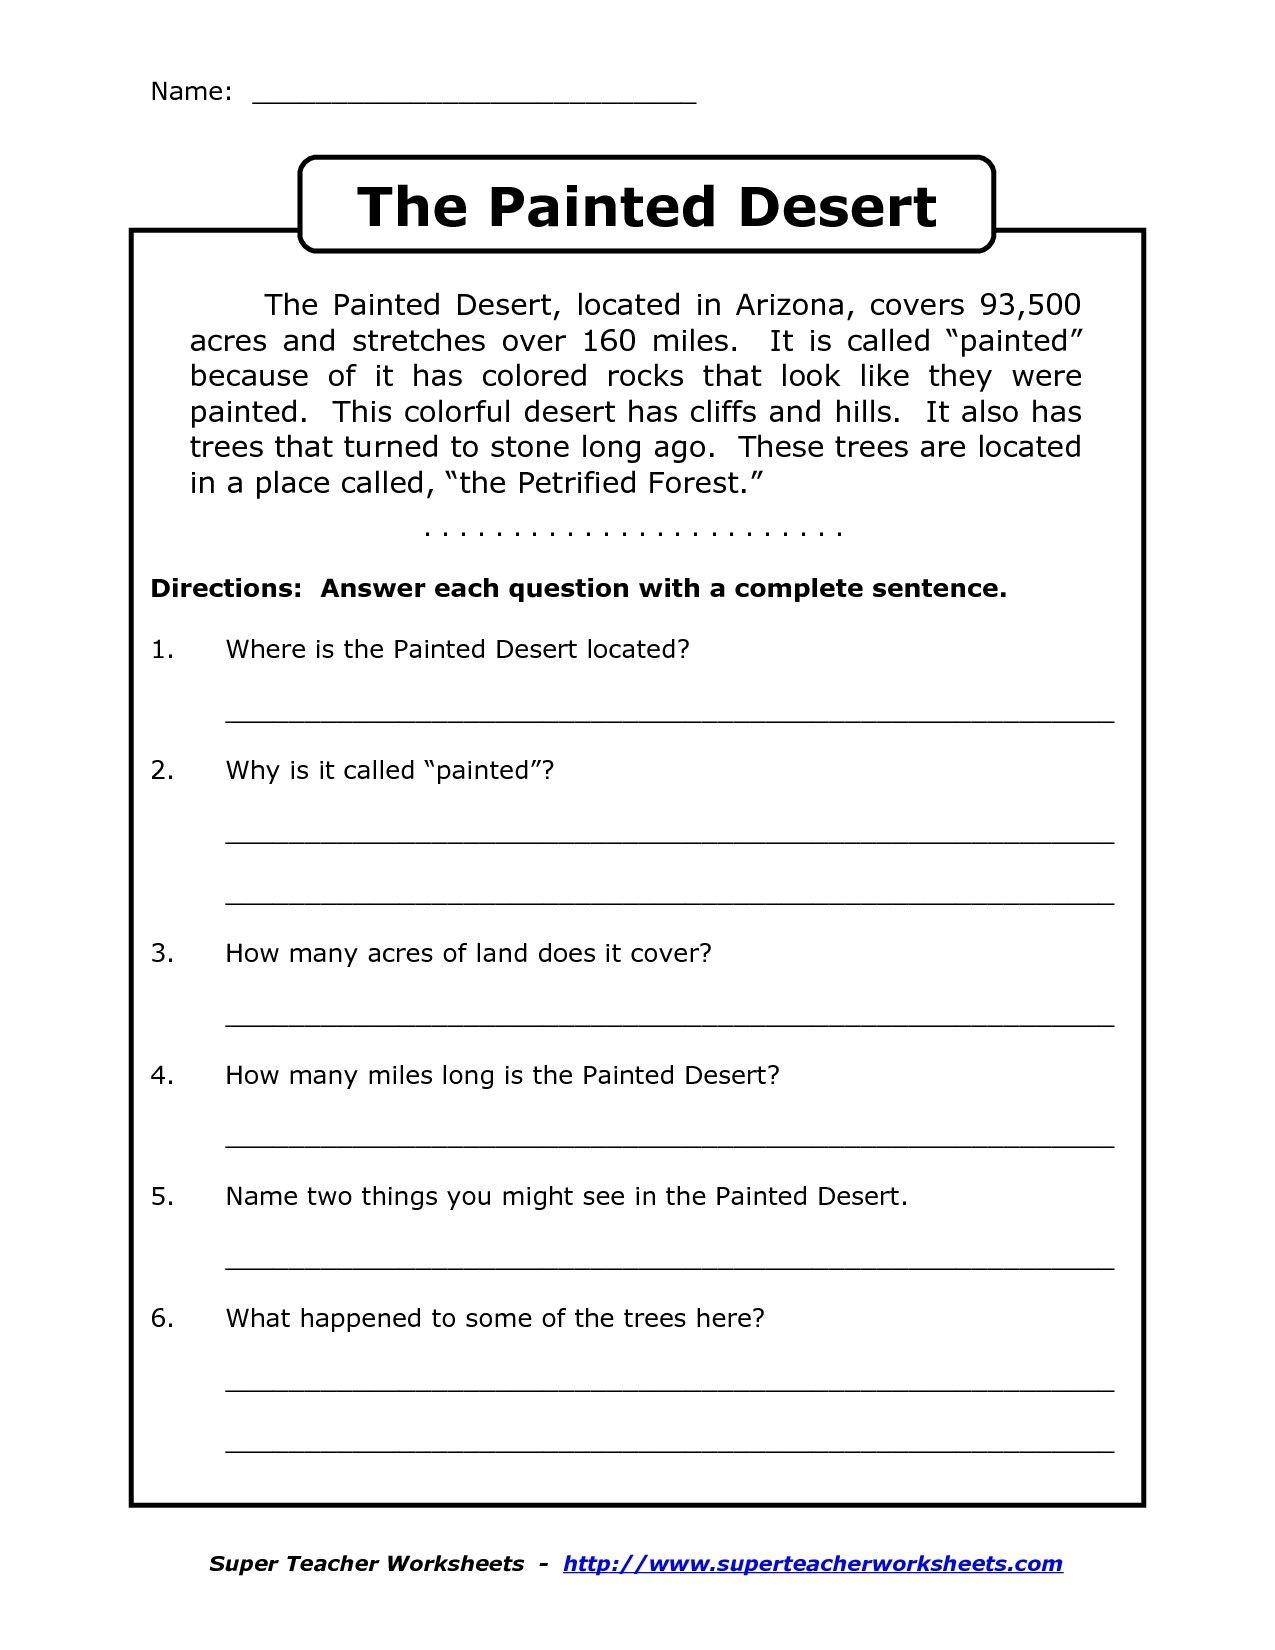 Image Result For Free Printable Worksheets For Grade 4 Comprehension - Free Printable 4Th Grade Reading Worksheets